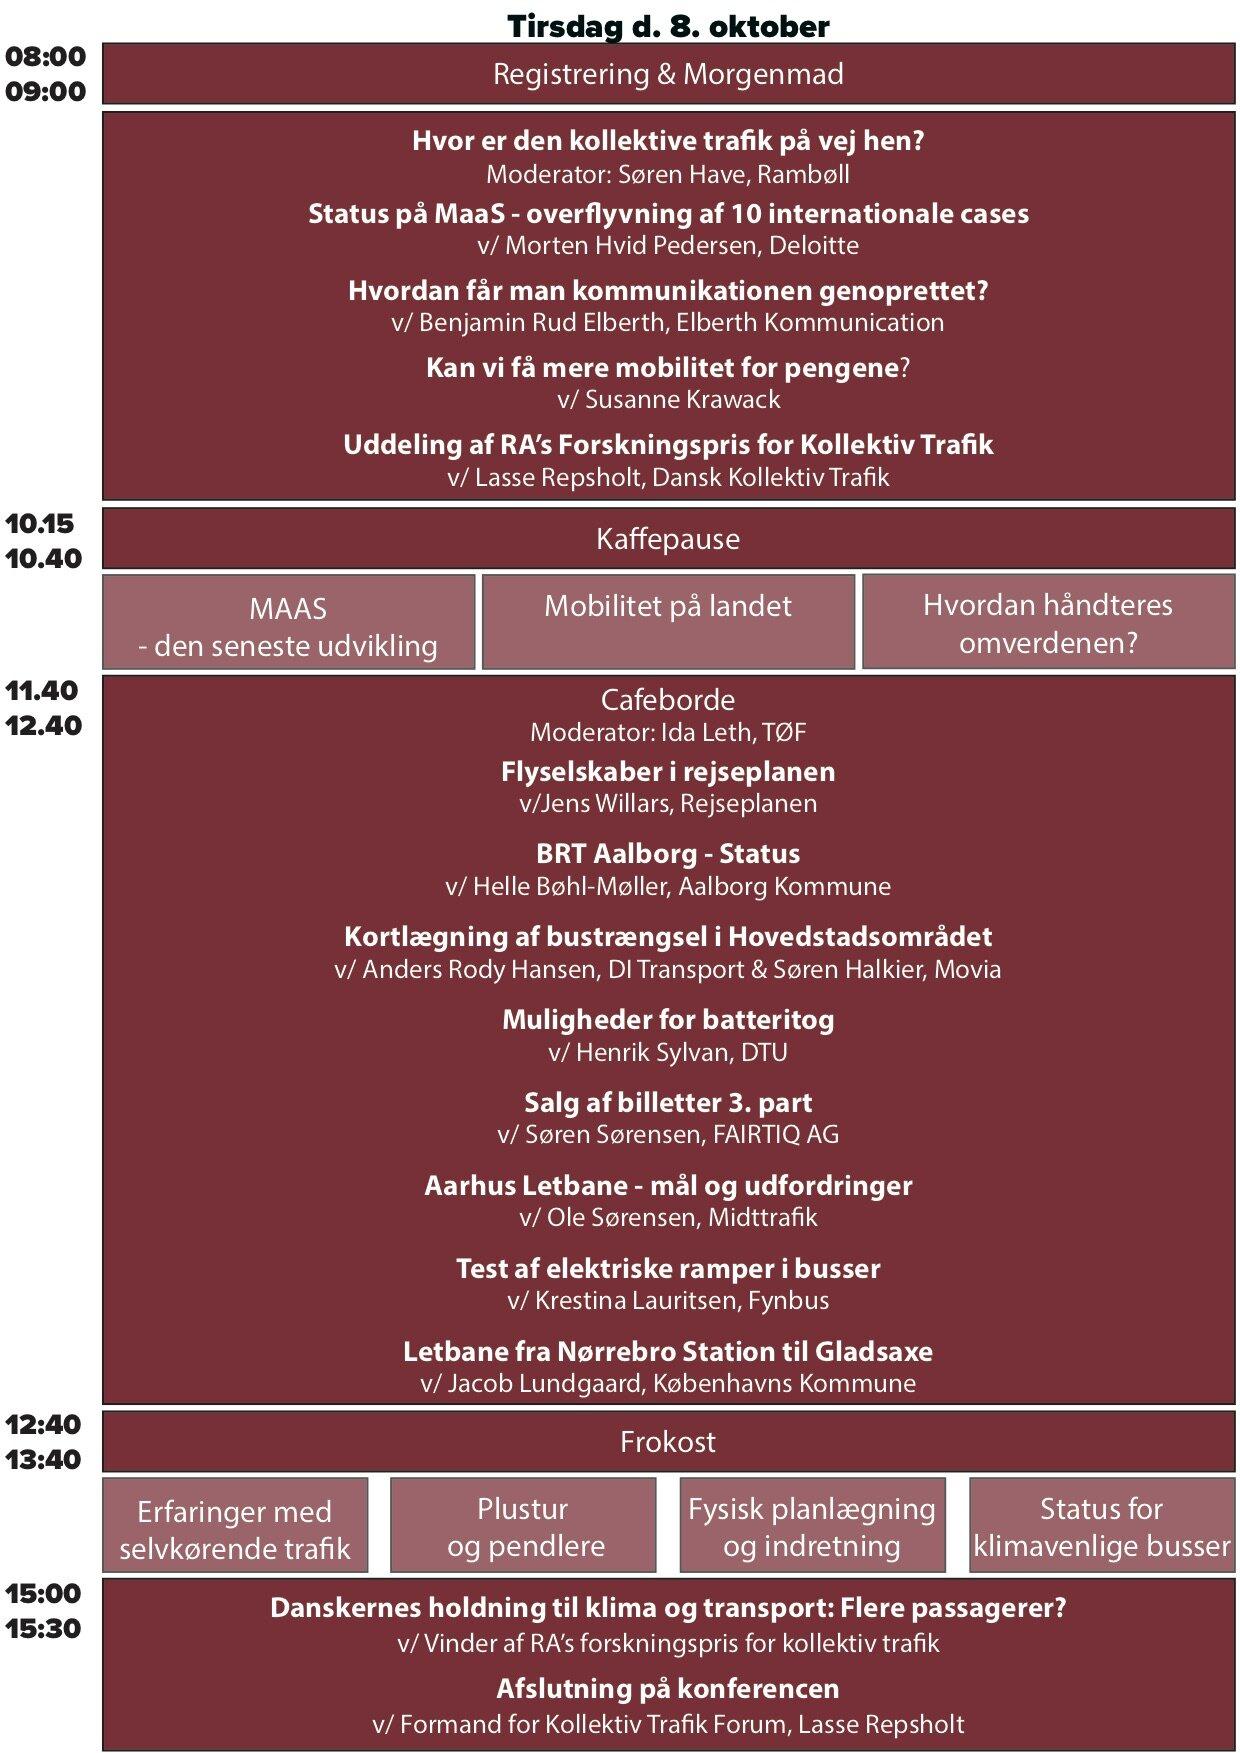 Tirsdag - Kollektiv Trafik Konference Program 2019 copy.jpg